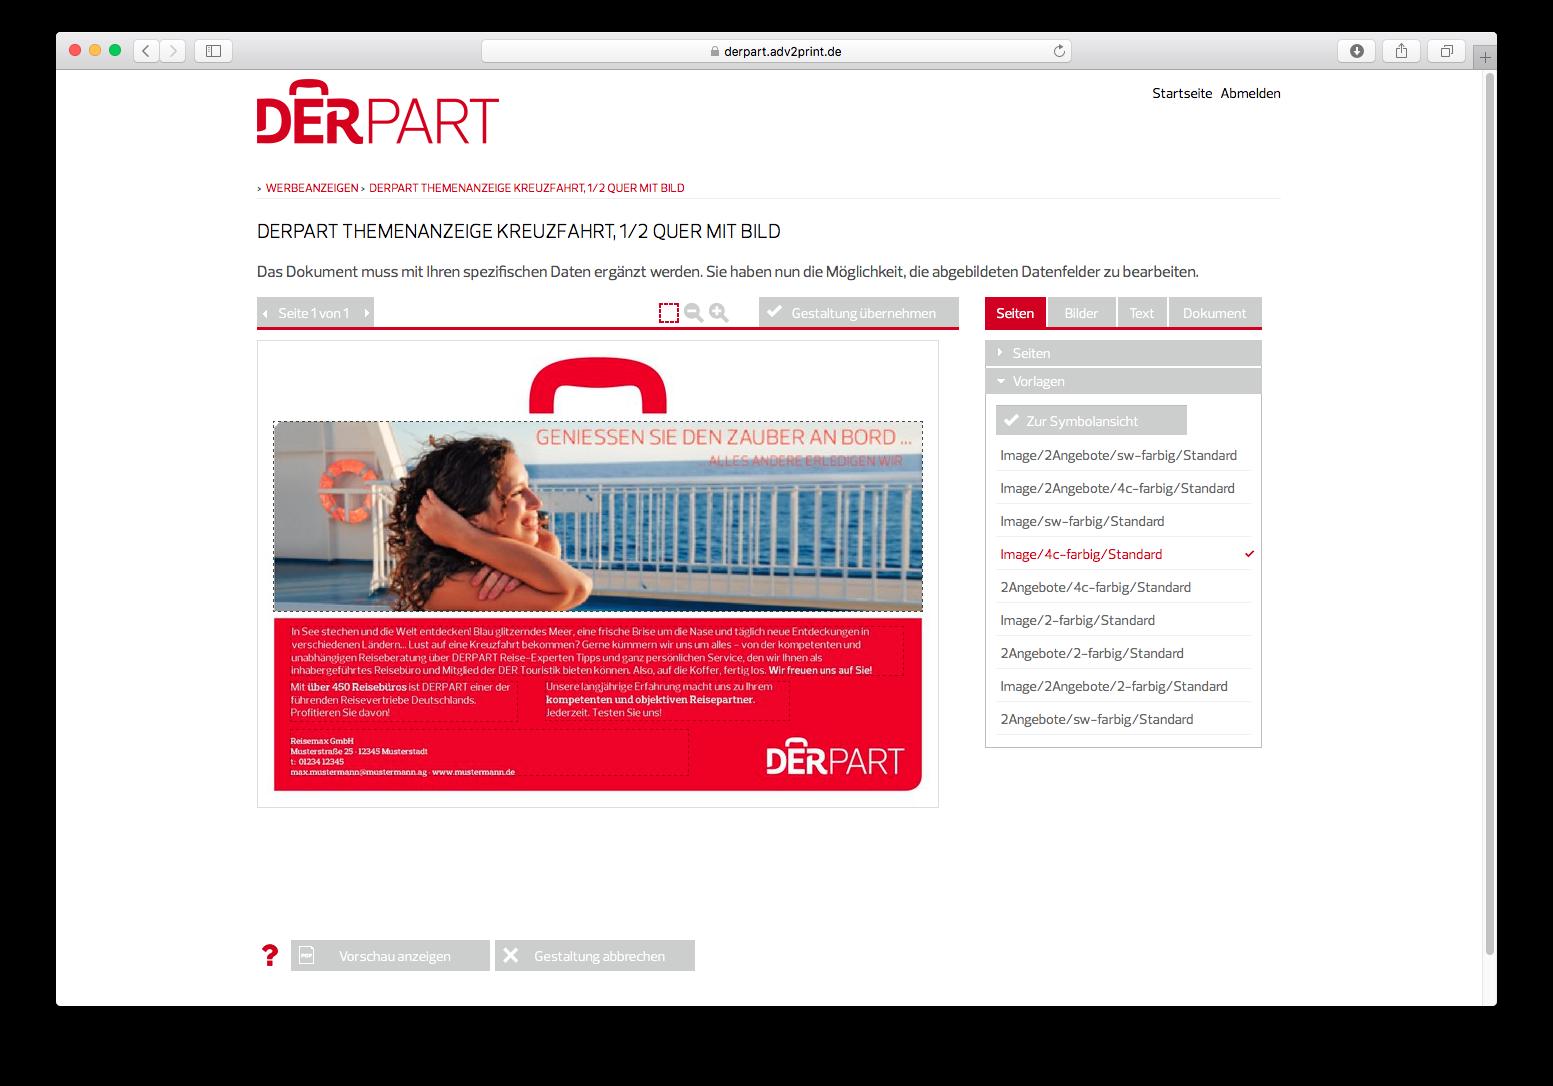 bk_derpart_web2print_6